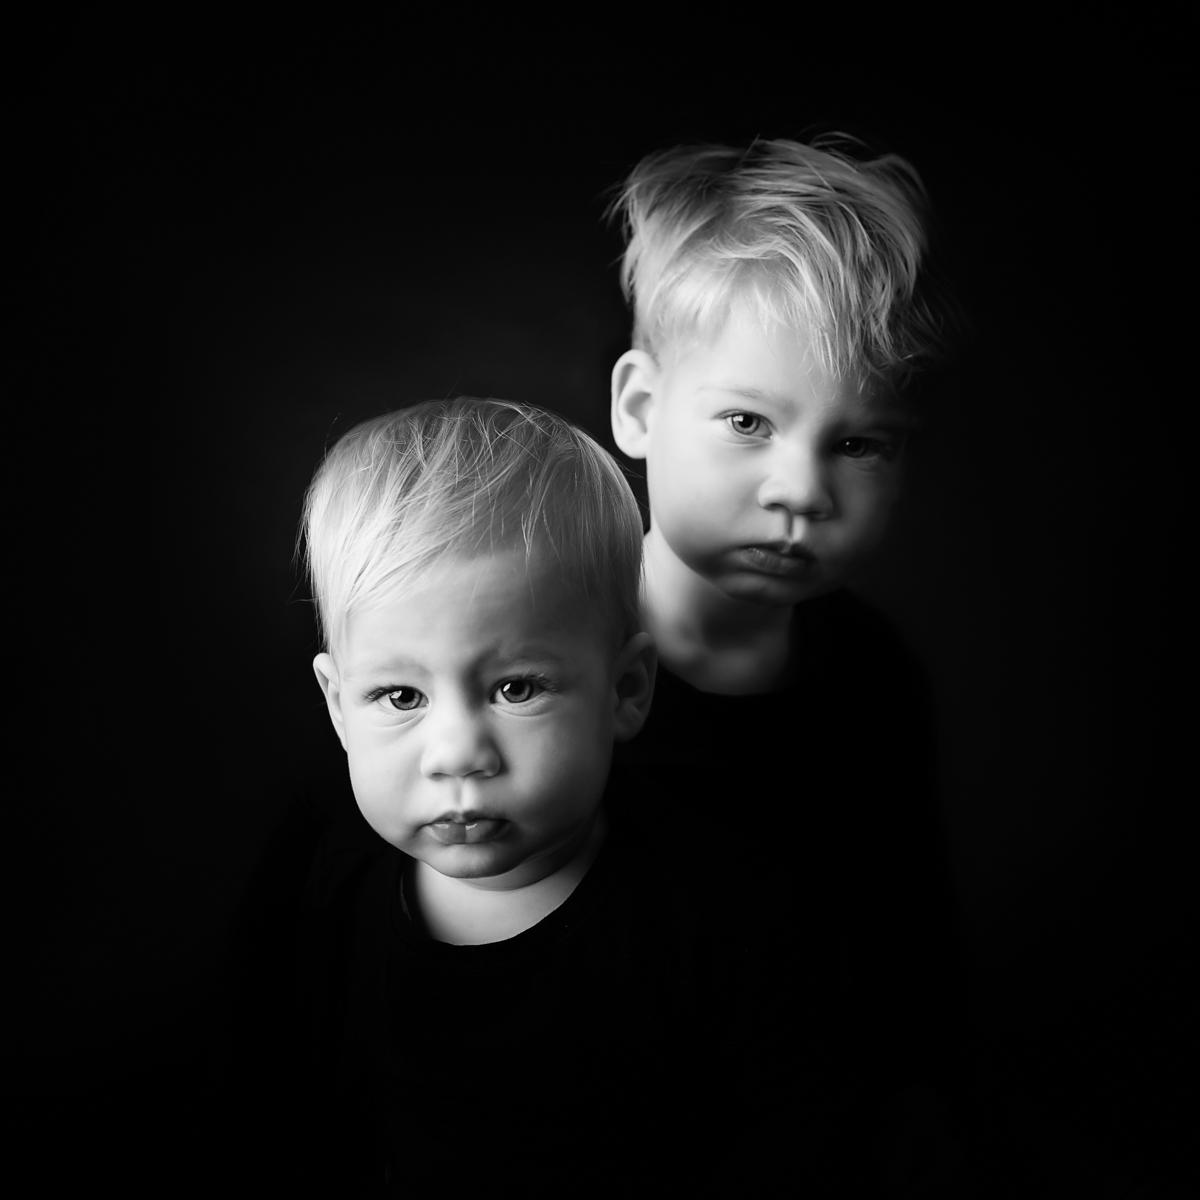 leukste baby sitter fotoshoot